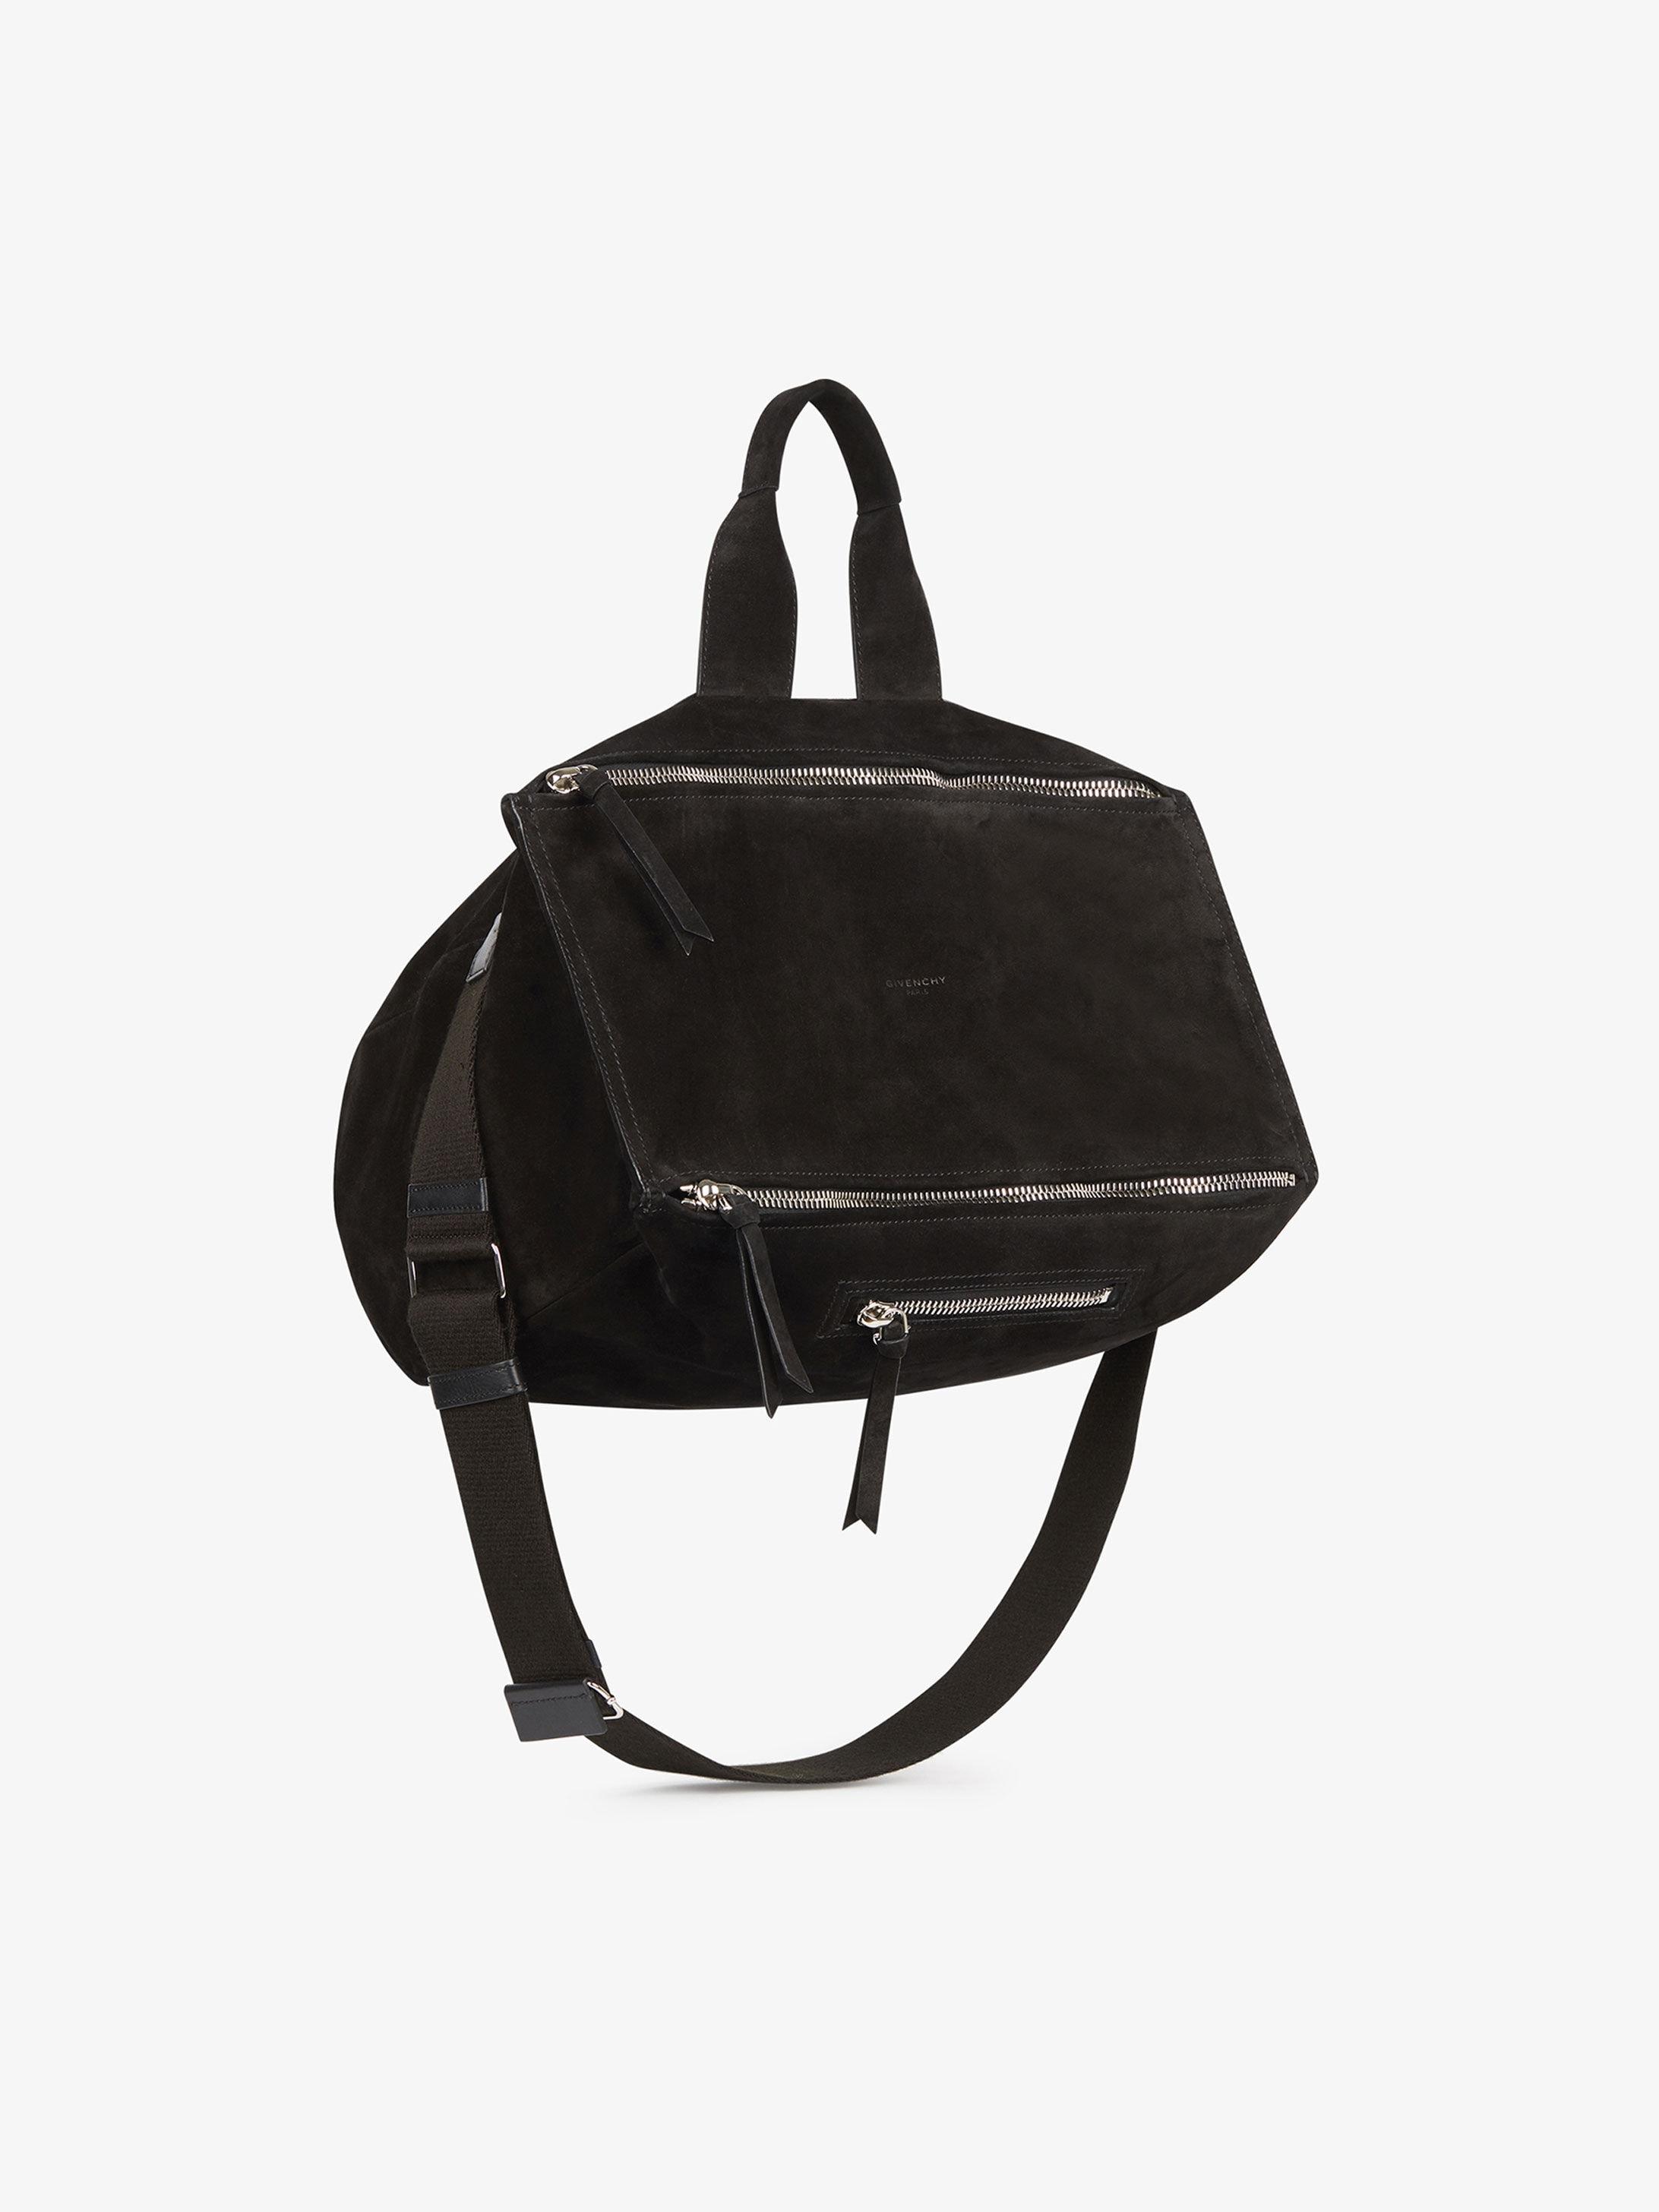 7d272db843fb Givenchy Pandora messenger bag in suede